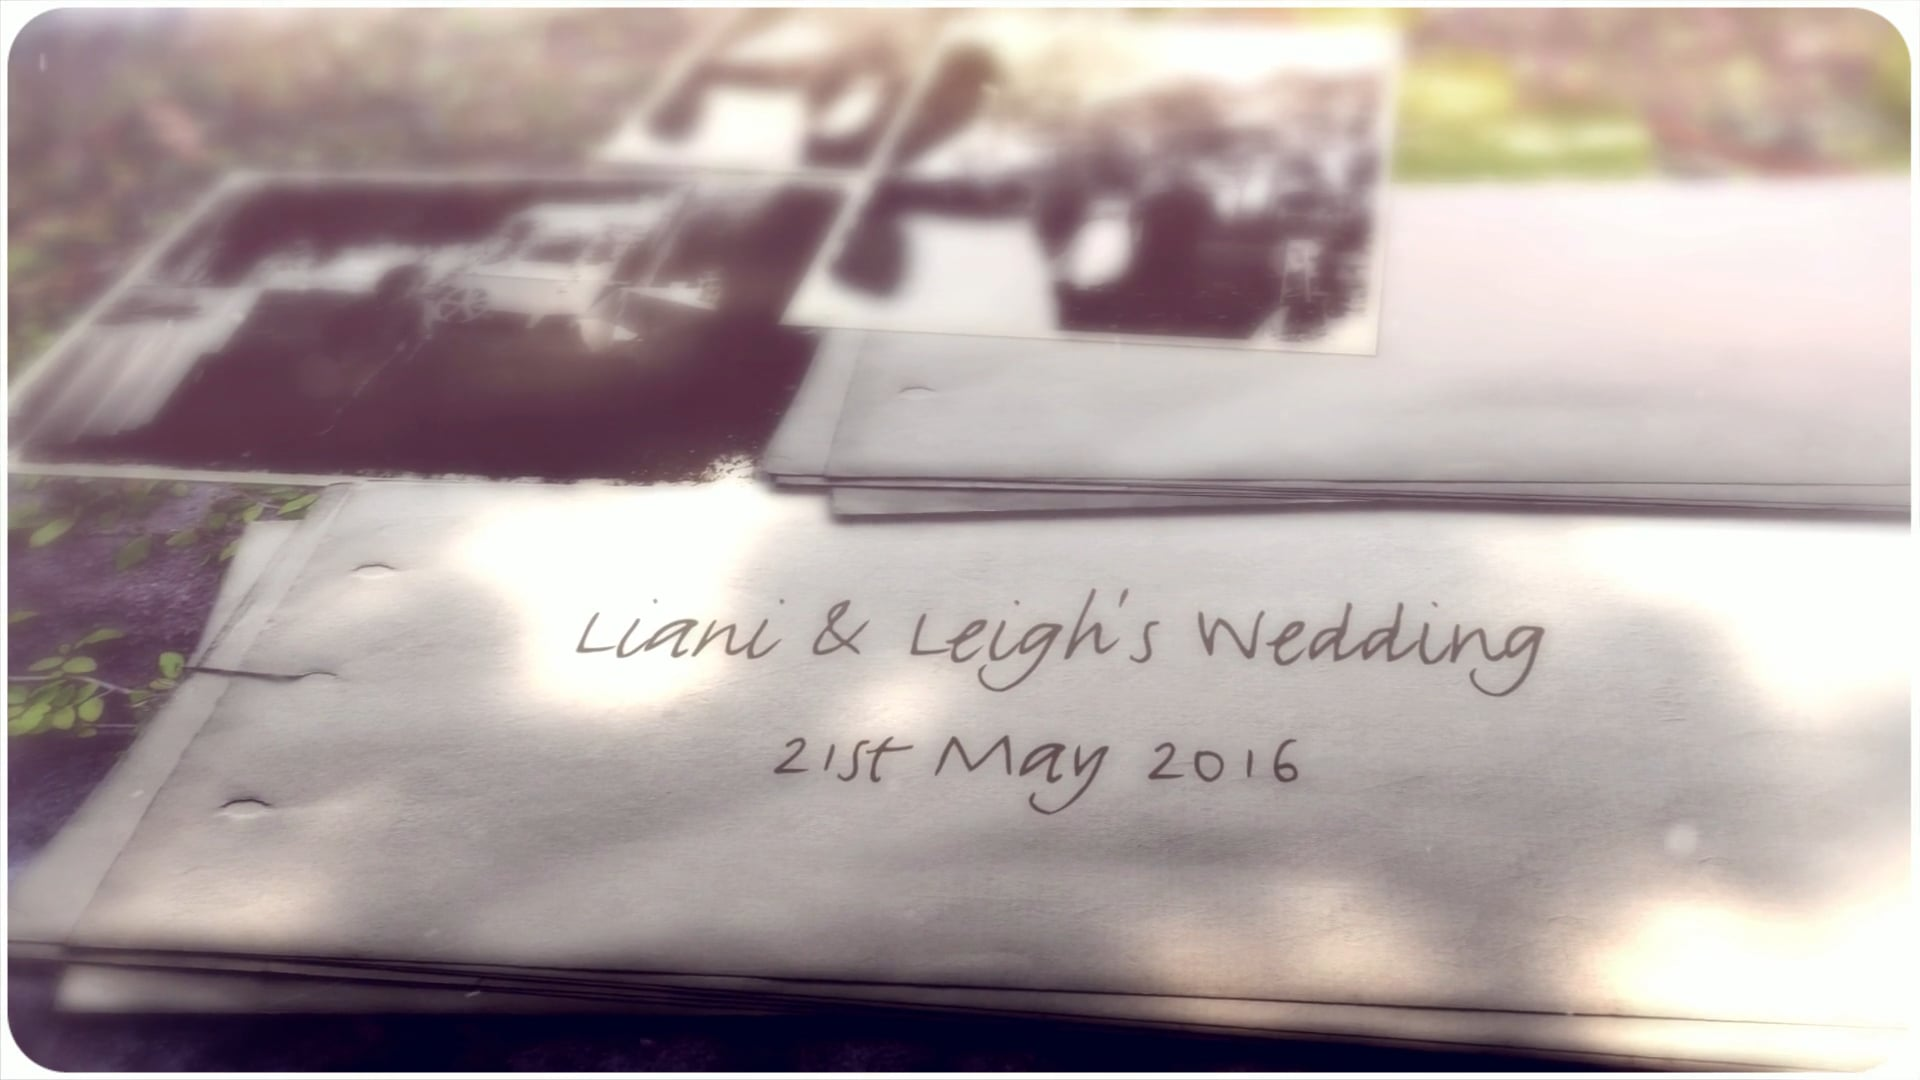 Liani & Leigh's Wedding Photo Slide Show